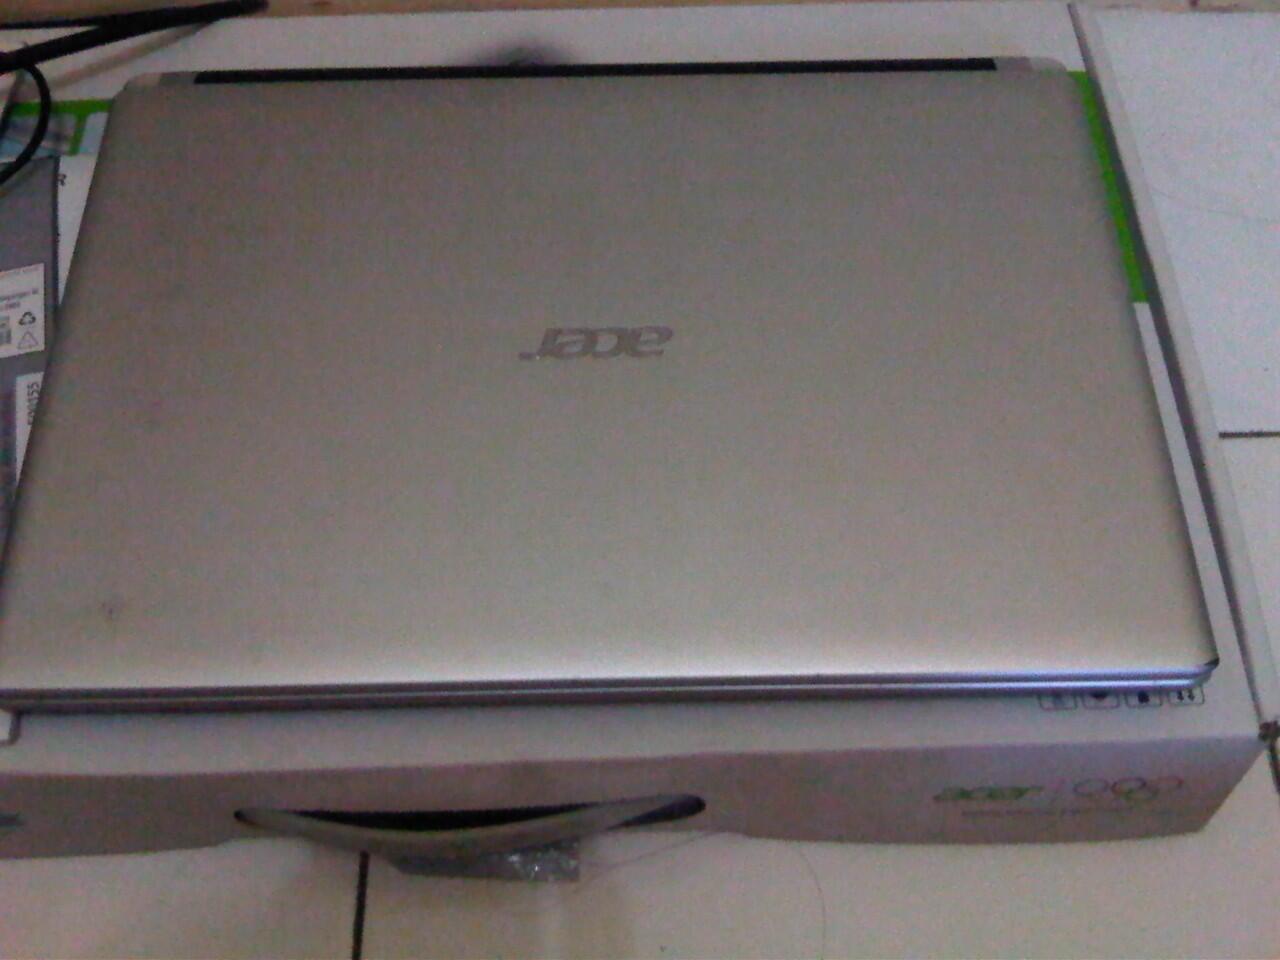 Laptop Slim ACER V5-431 Intel B877 FULL SET SEGEL [Bandung]